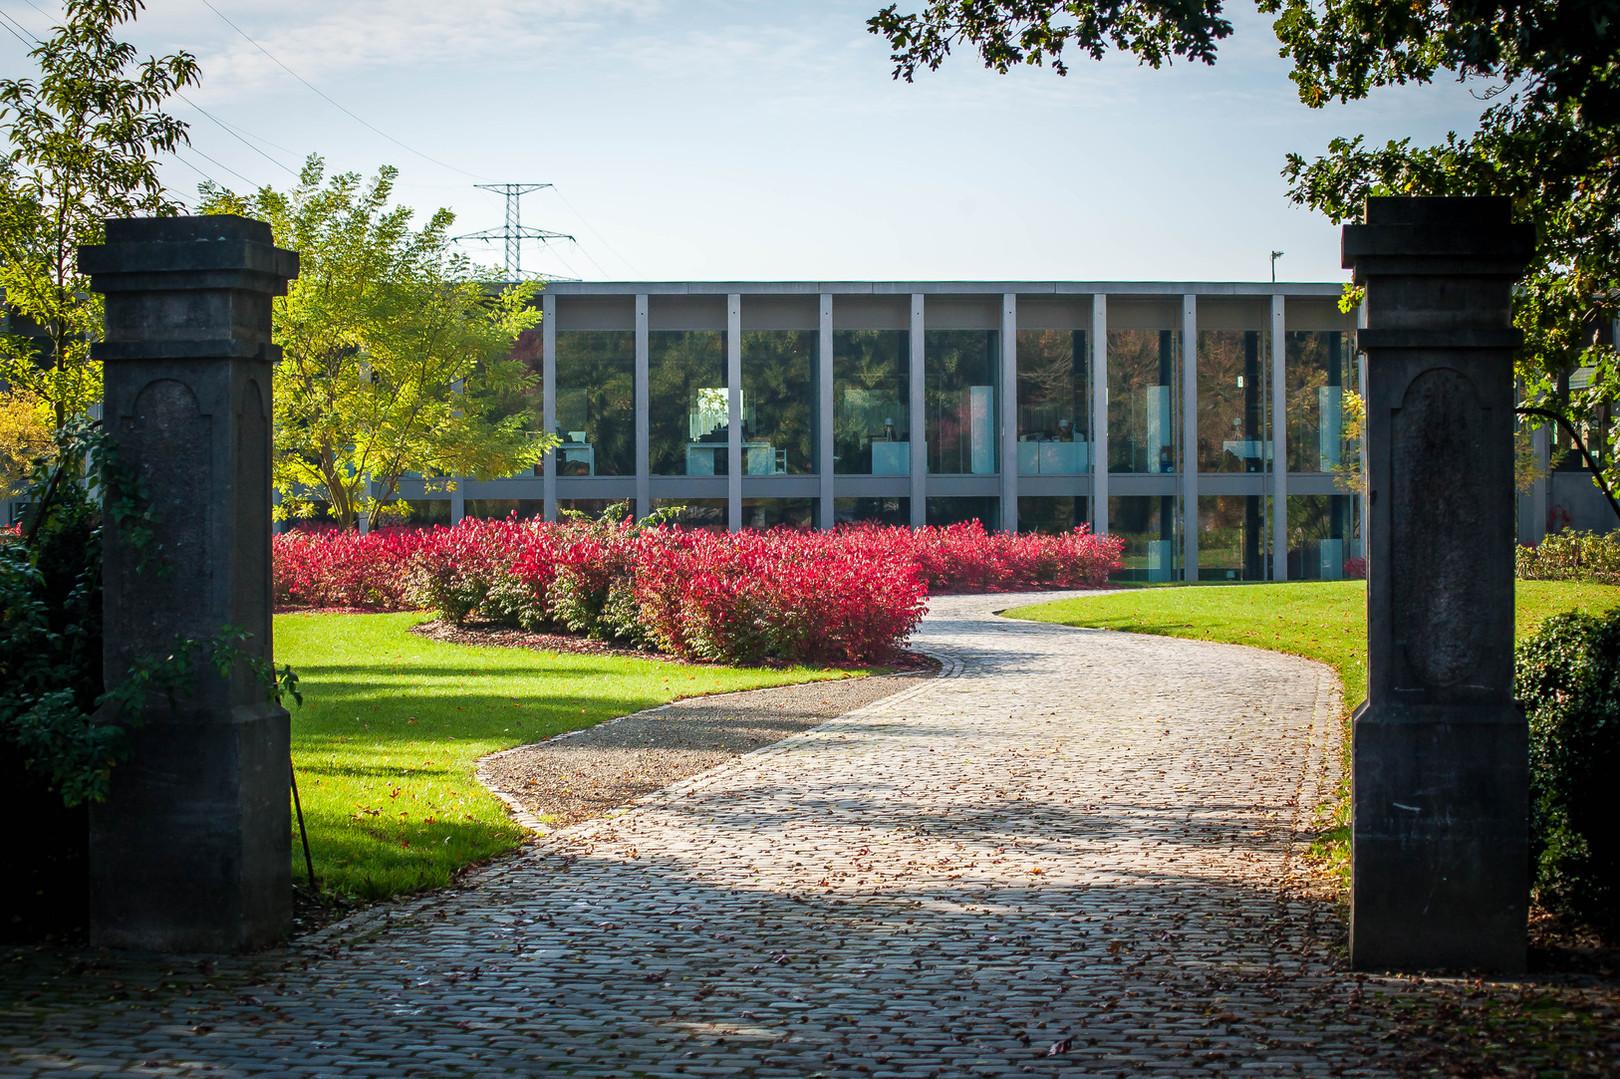 Bedrijfstuin Midden-Limburg